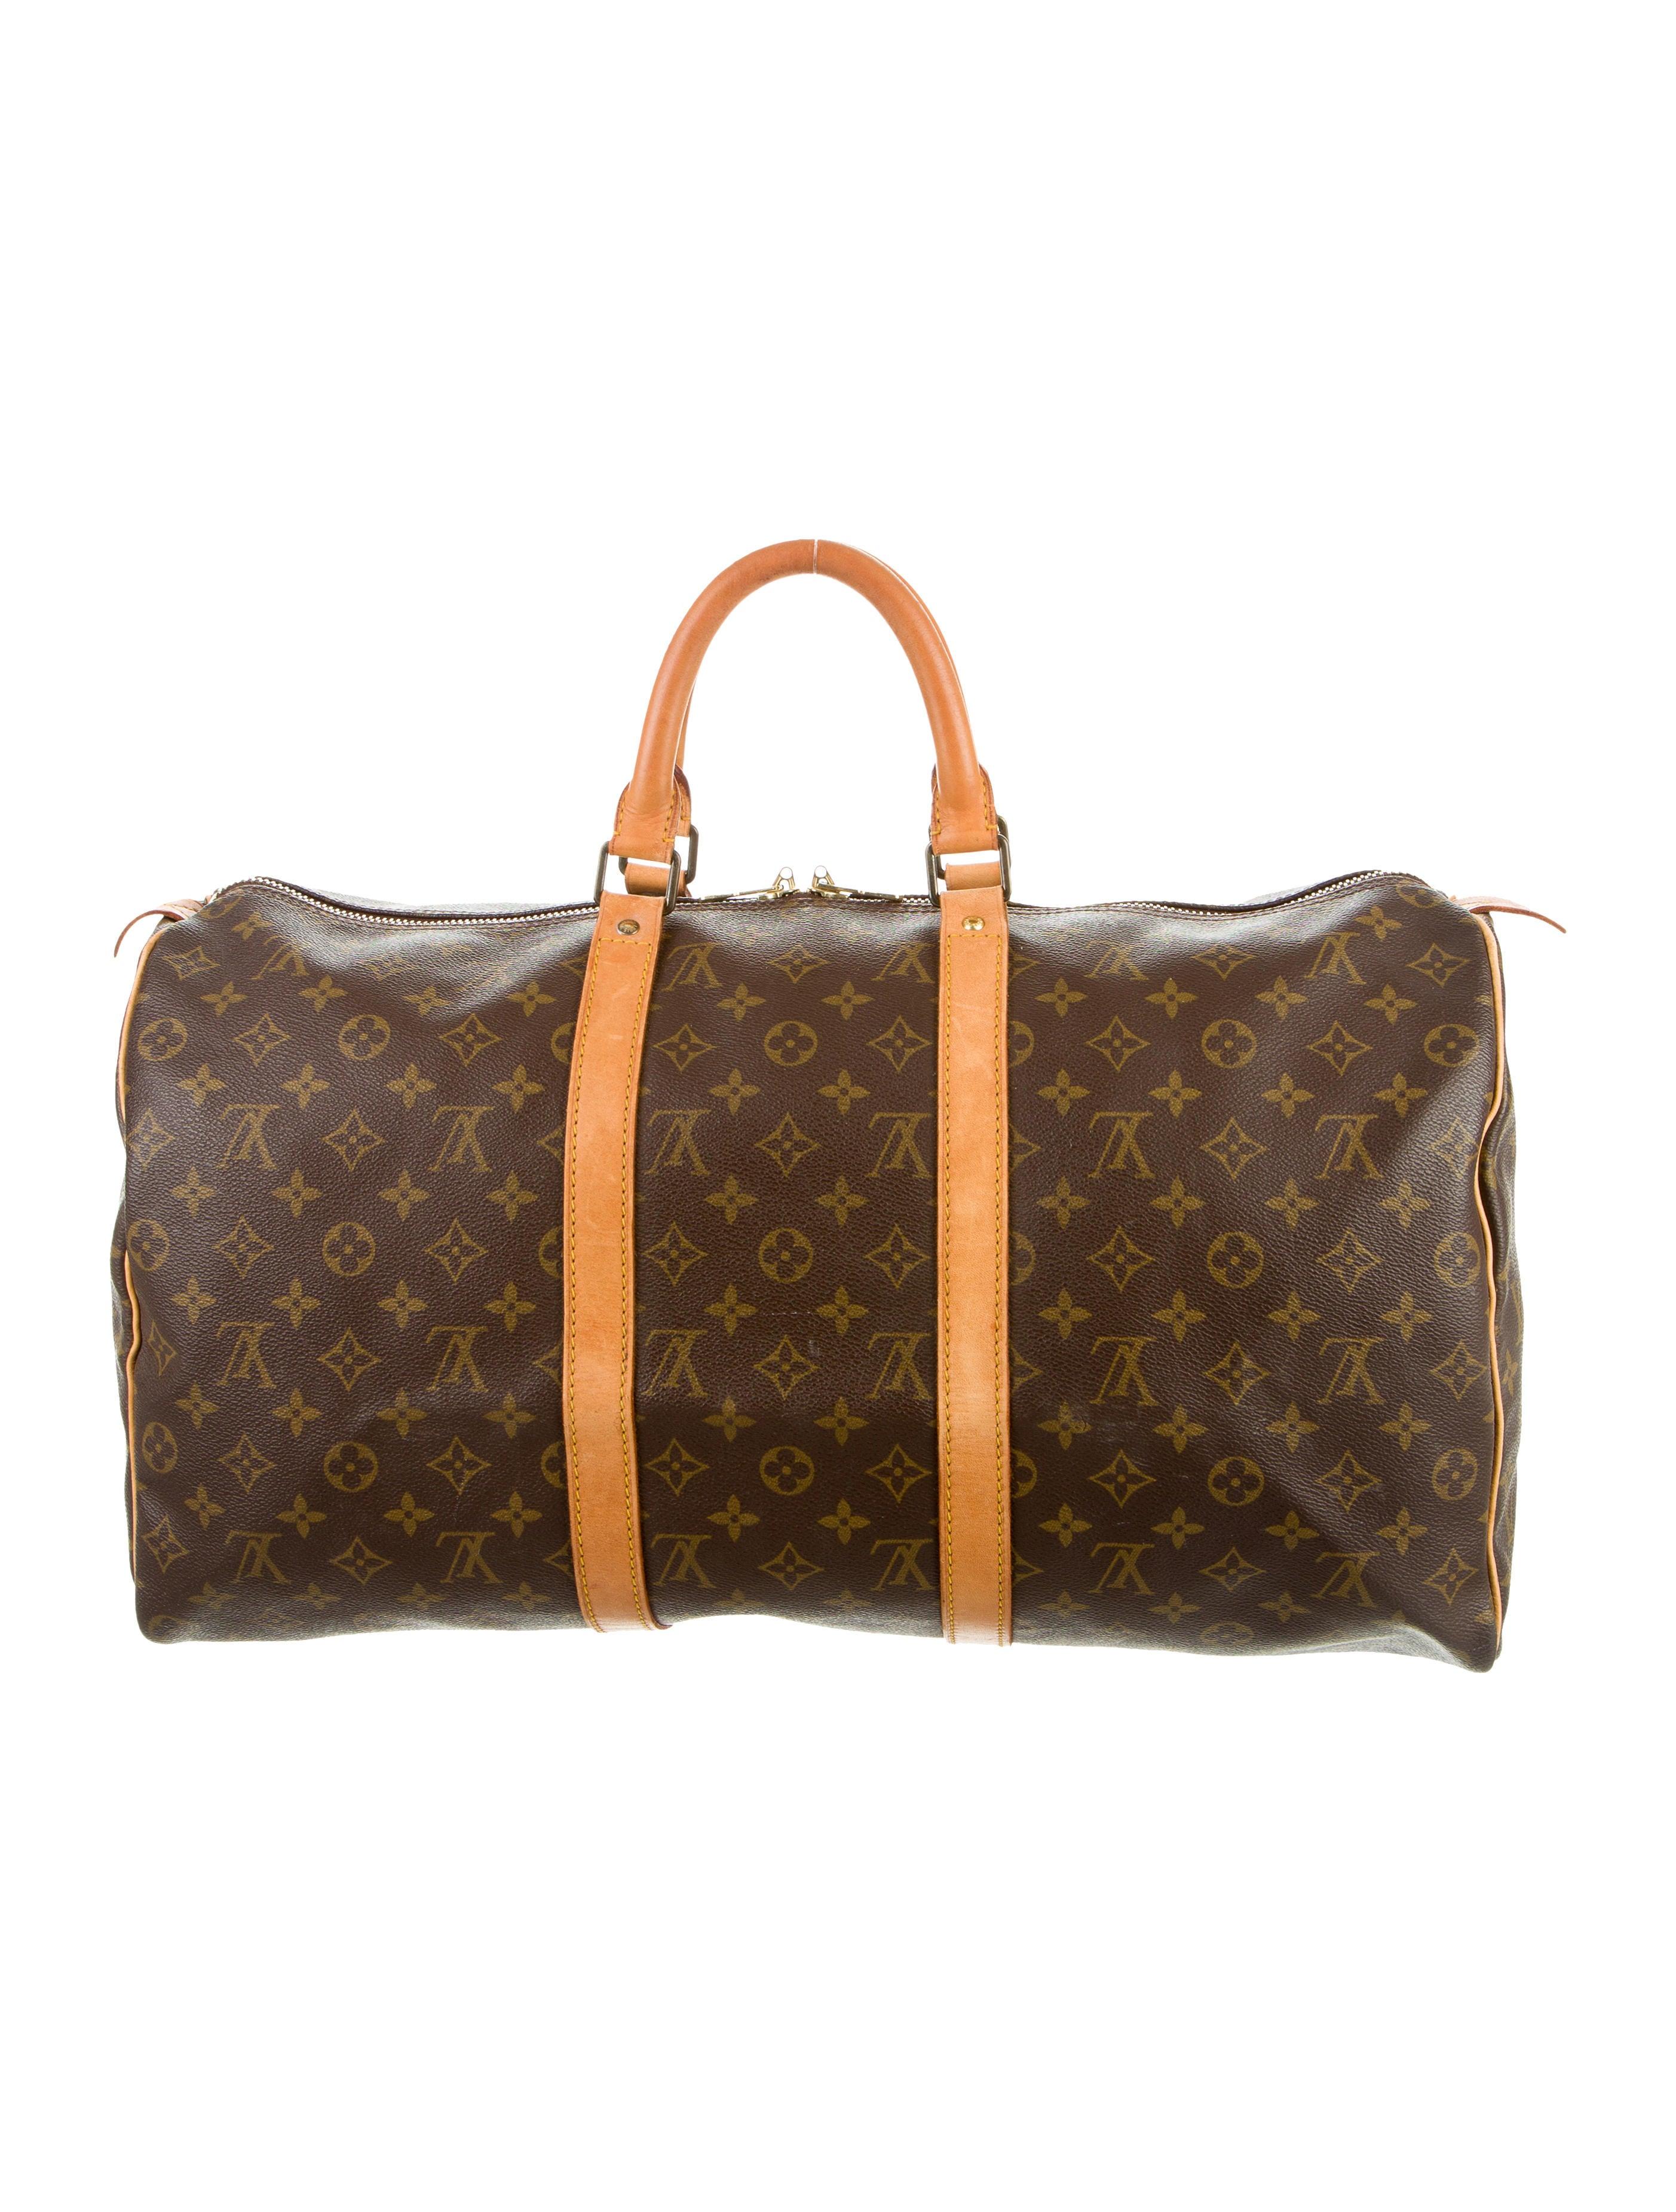 louis vuitton monogram keepall 50 handbags lou111726. Black Bedroom Furniture Sets. Home Design Ideas